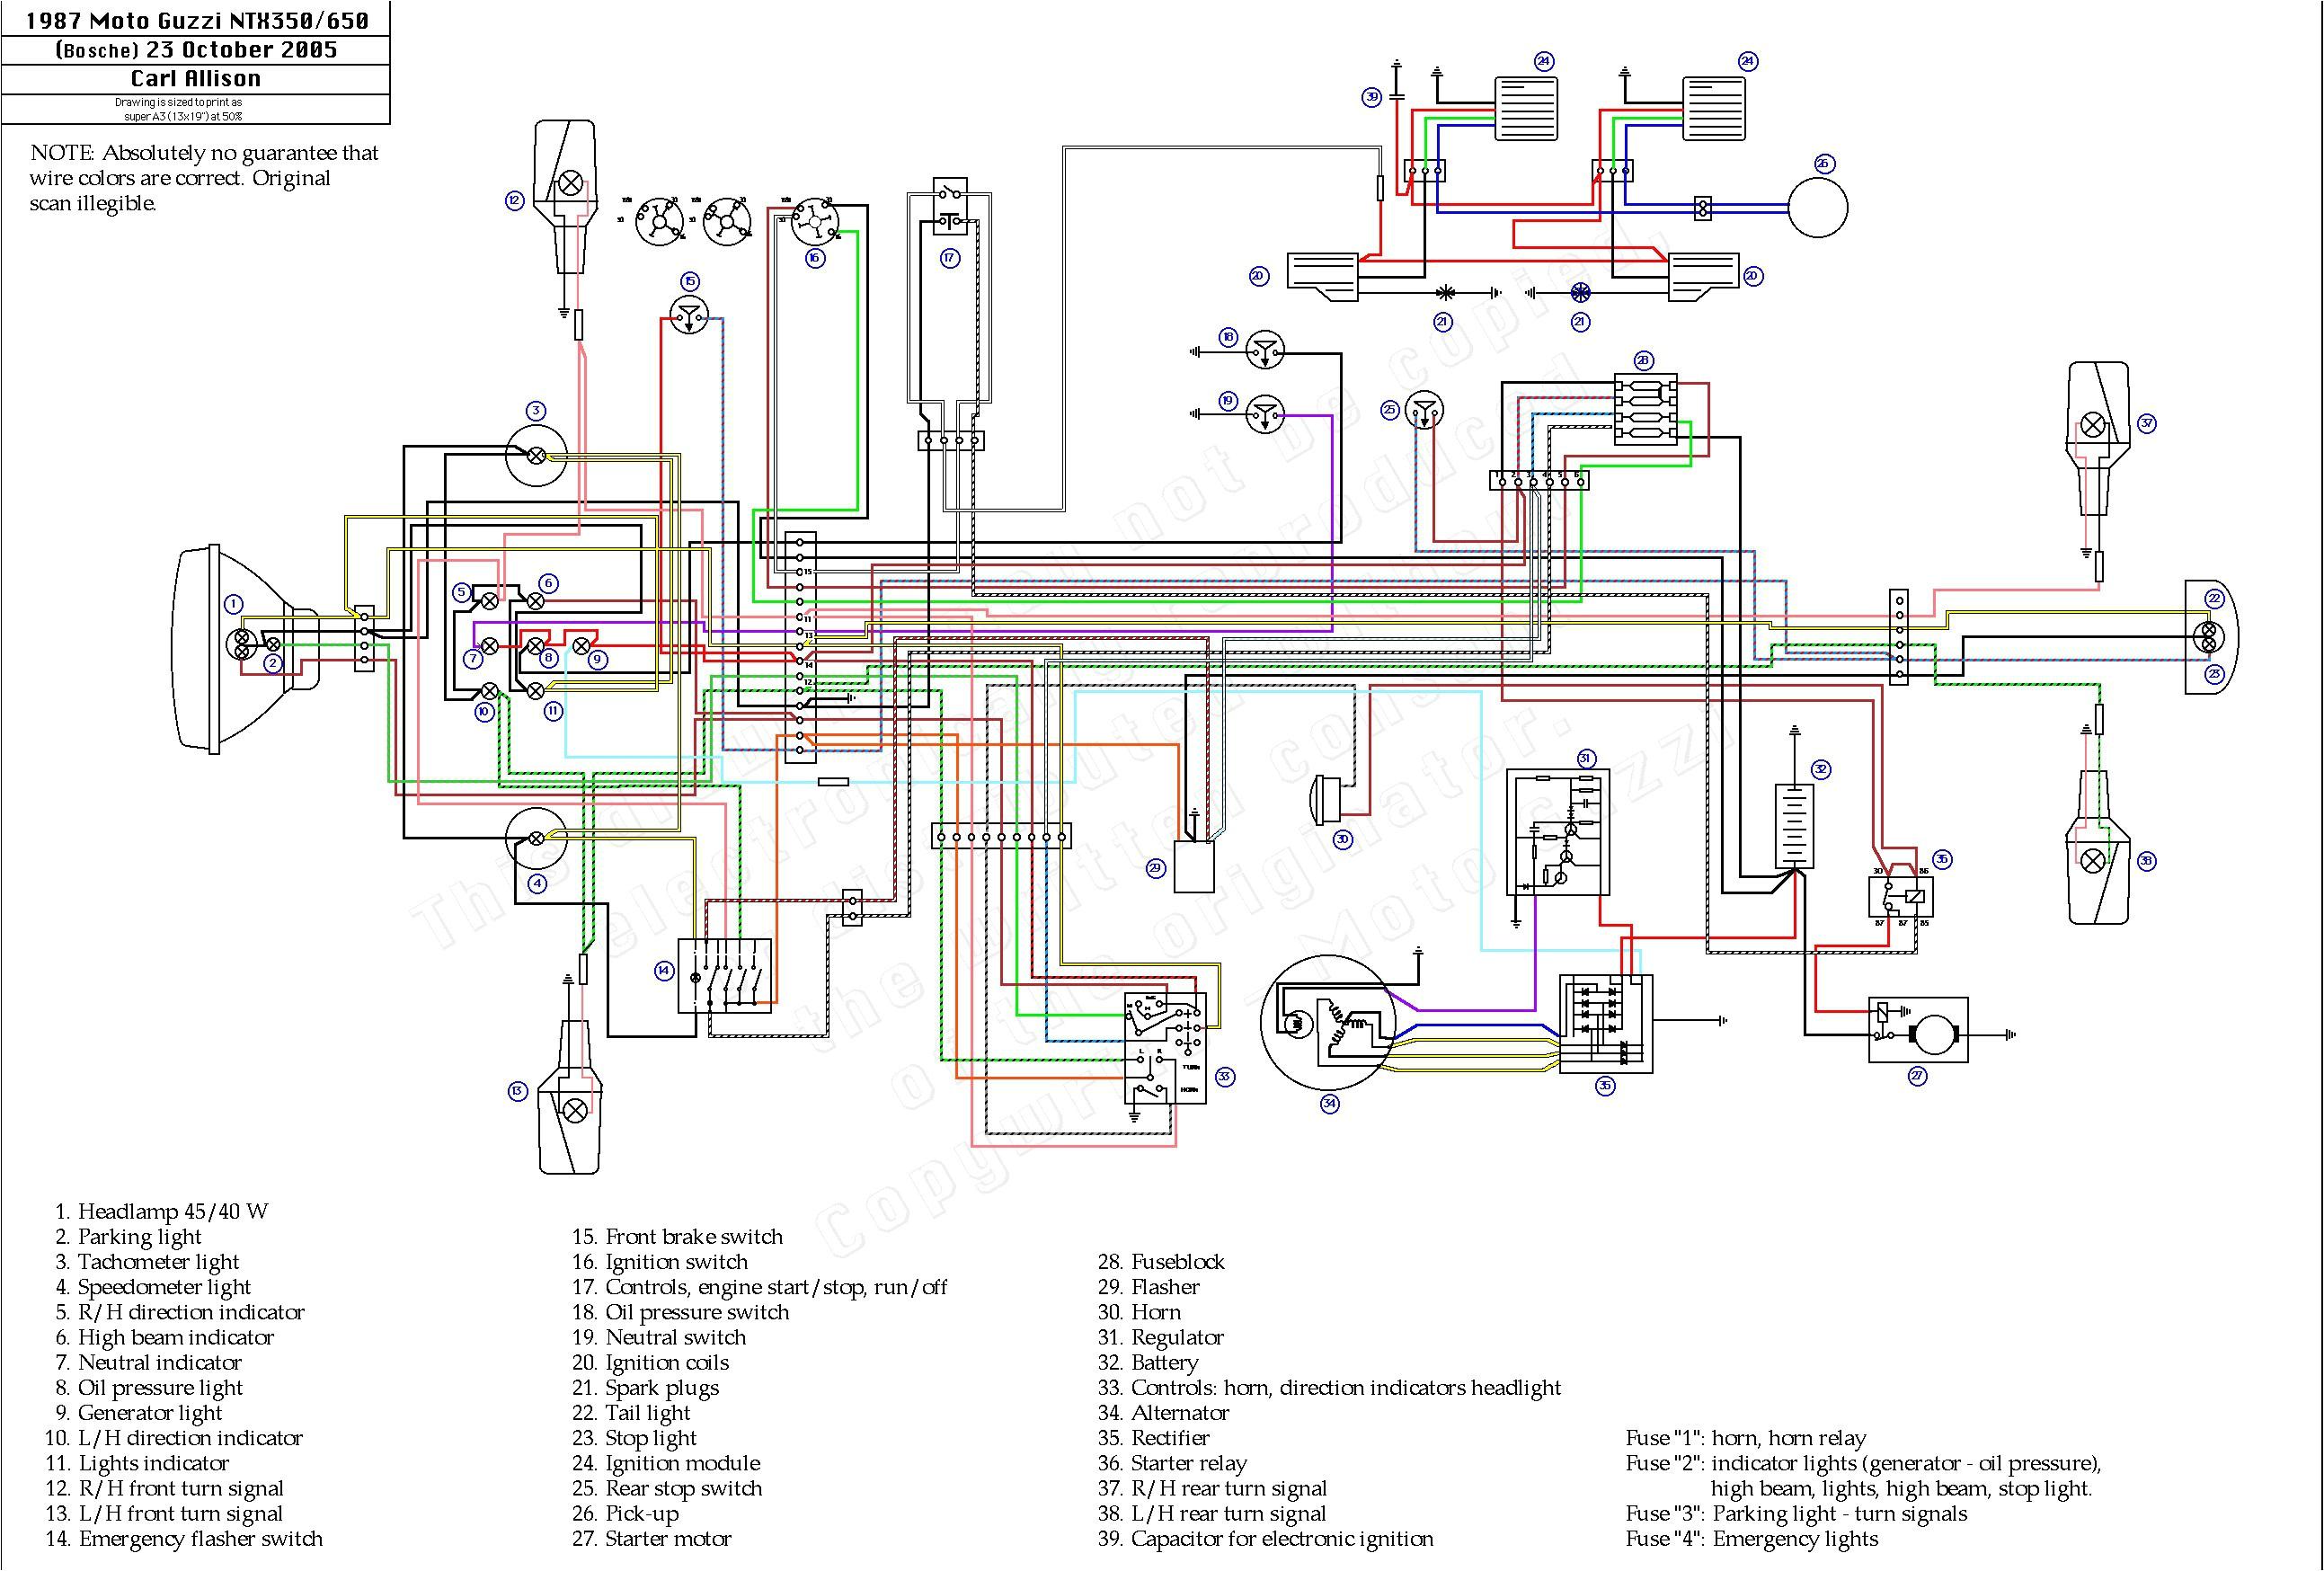 Coolster atv Wiring Diagram Qiye 150cc Engine Diagram Wiring Diagram